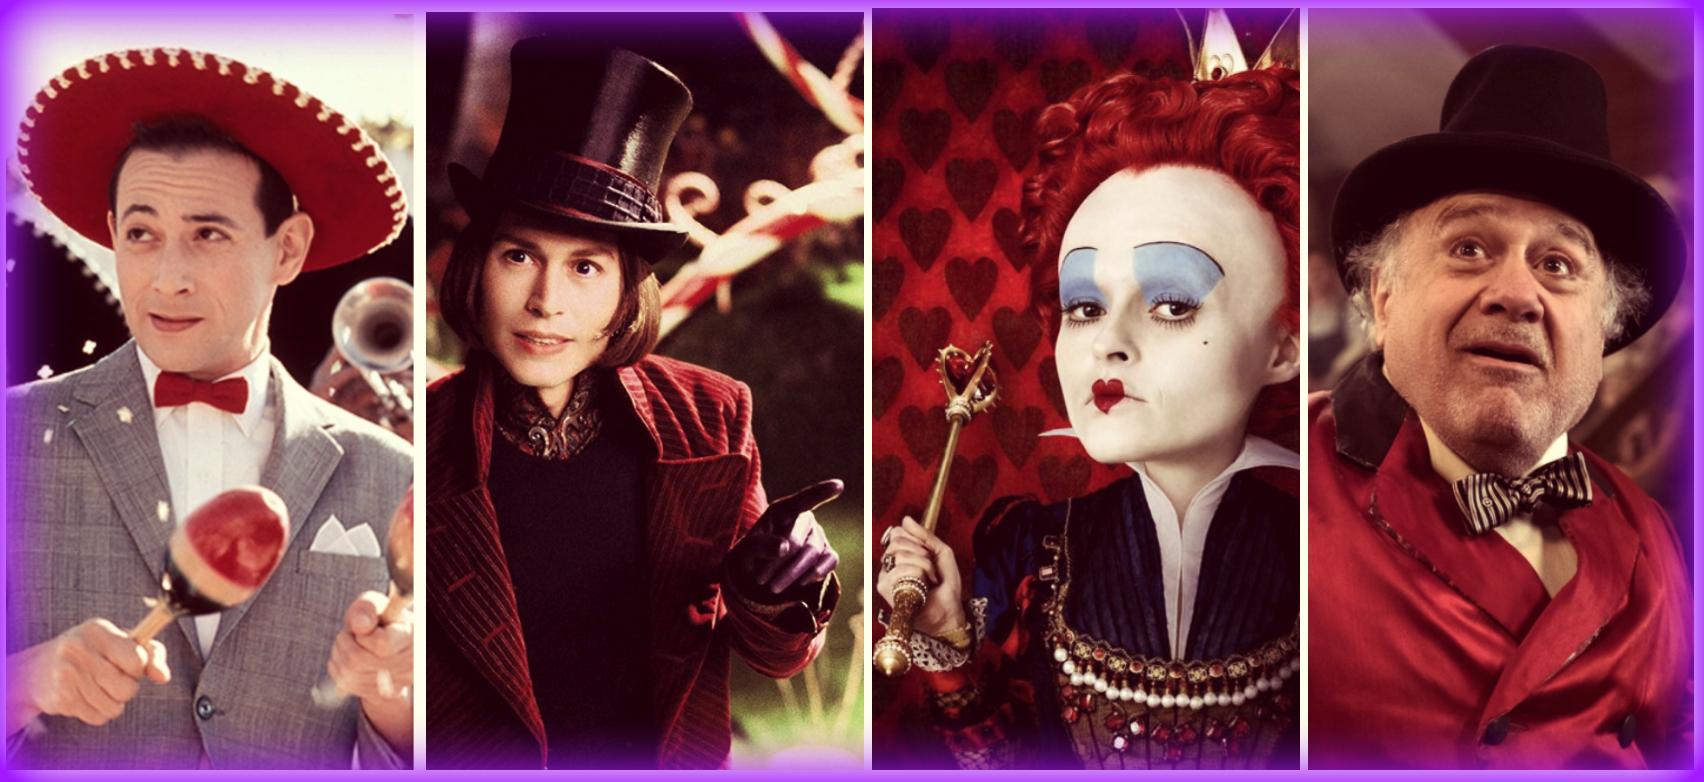 Pee-wee's Big Adventure, Charlie and the Chocolate Factory, Alice in Wonderland, Dumbo